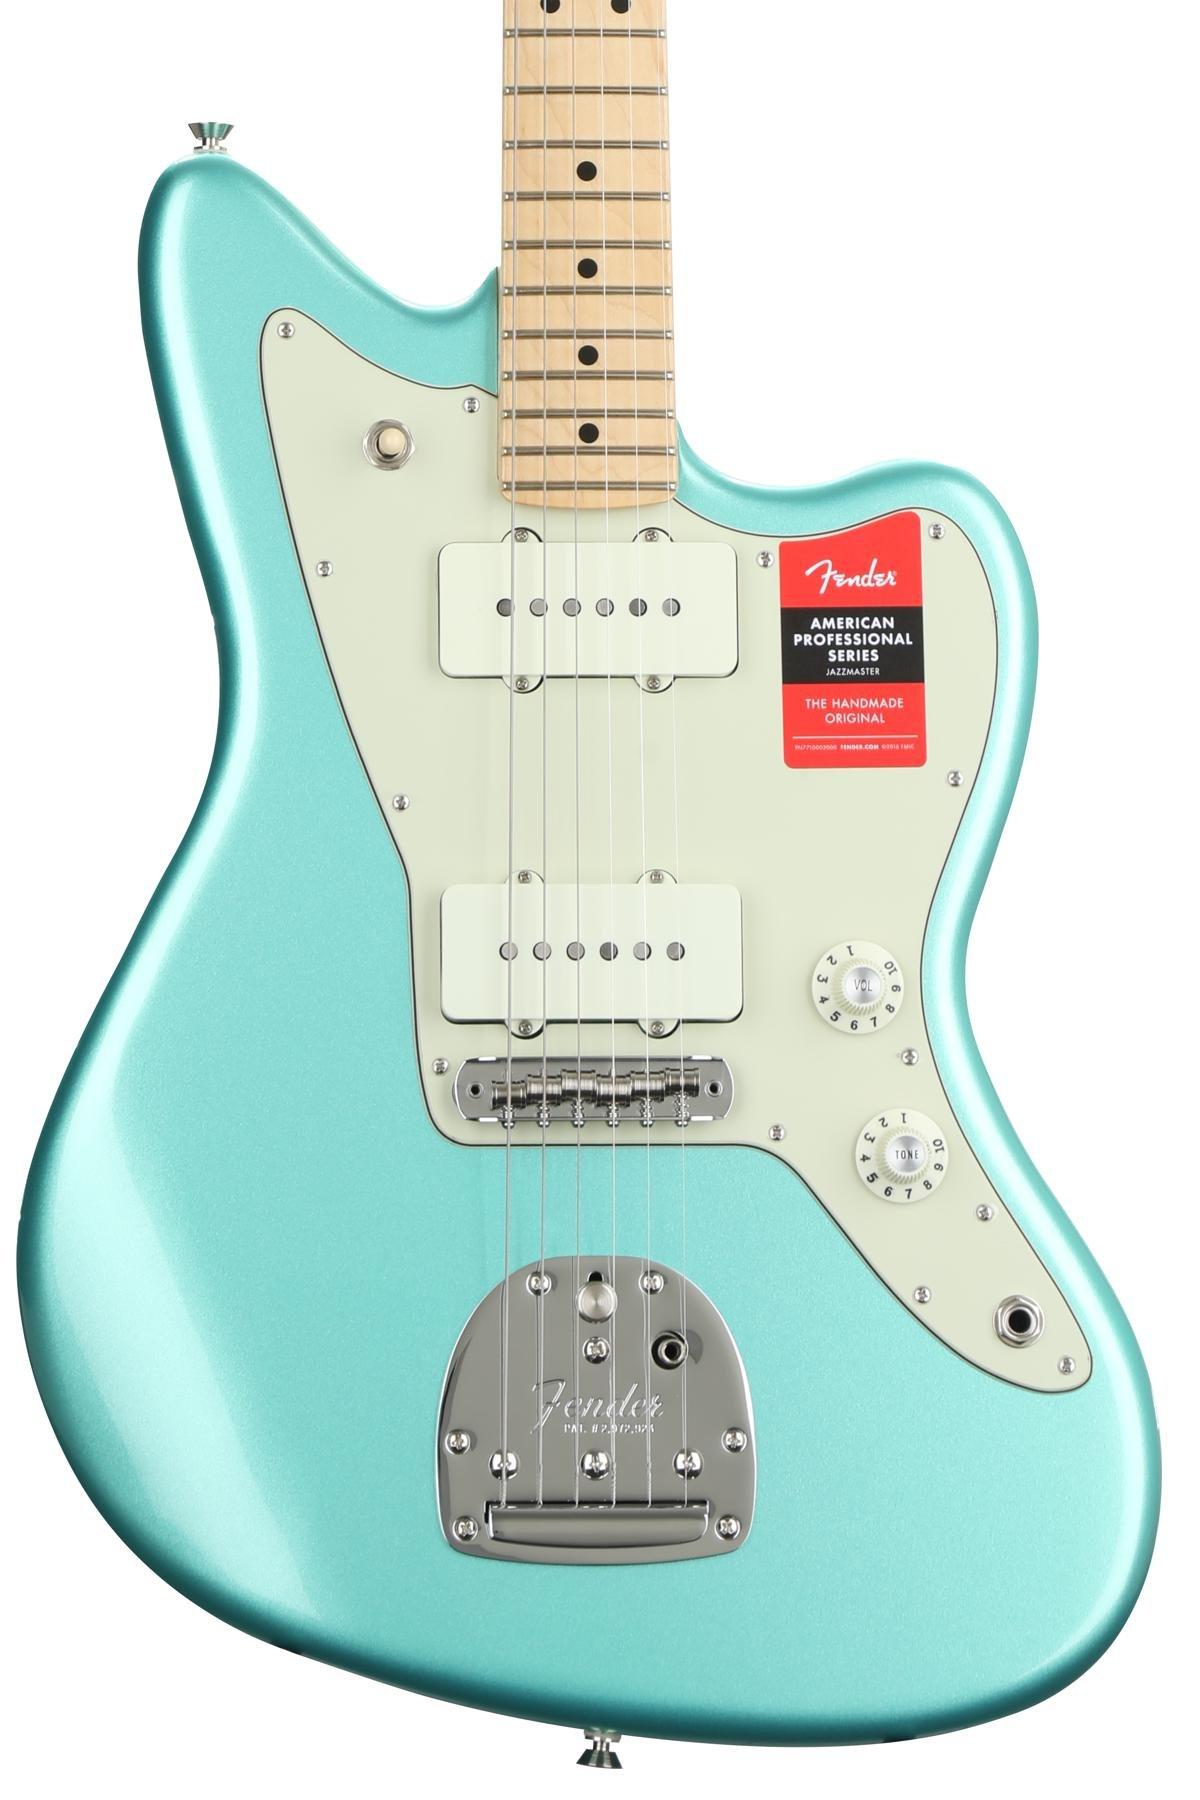 Fender American Professional Jazzmaster Mystic Seafoam W Maple Wiring Diagram 50 S Fingerboard Image 1